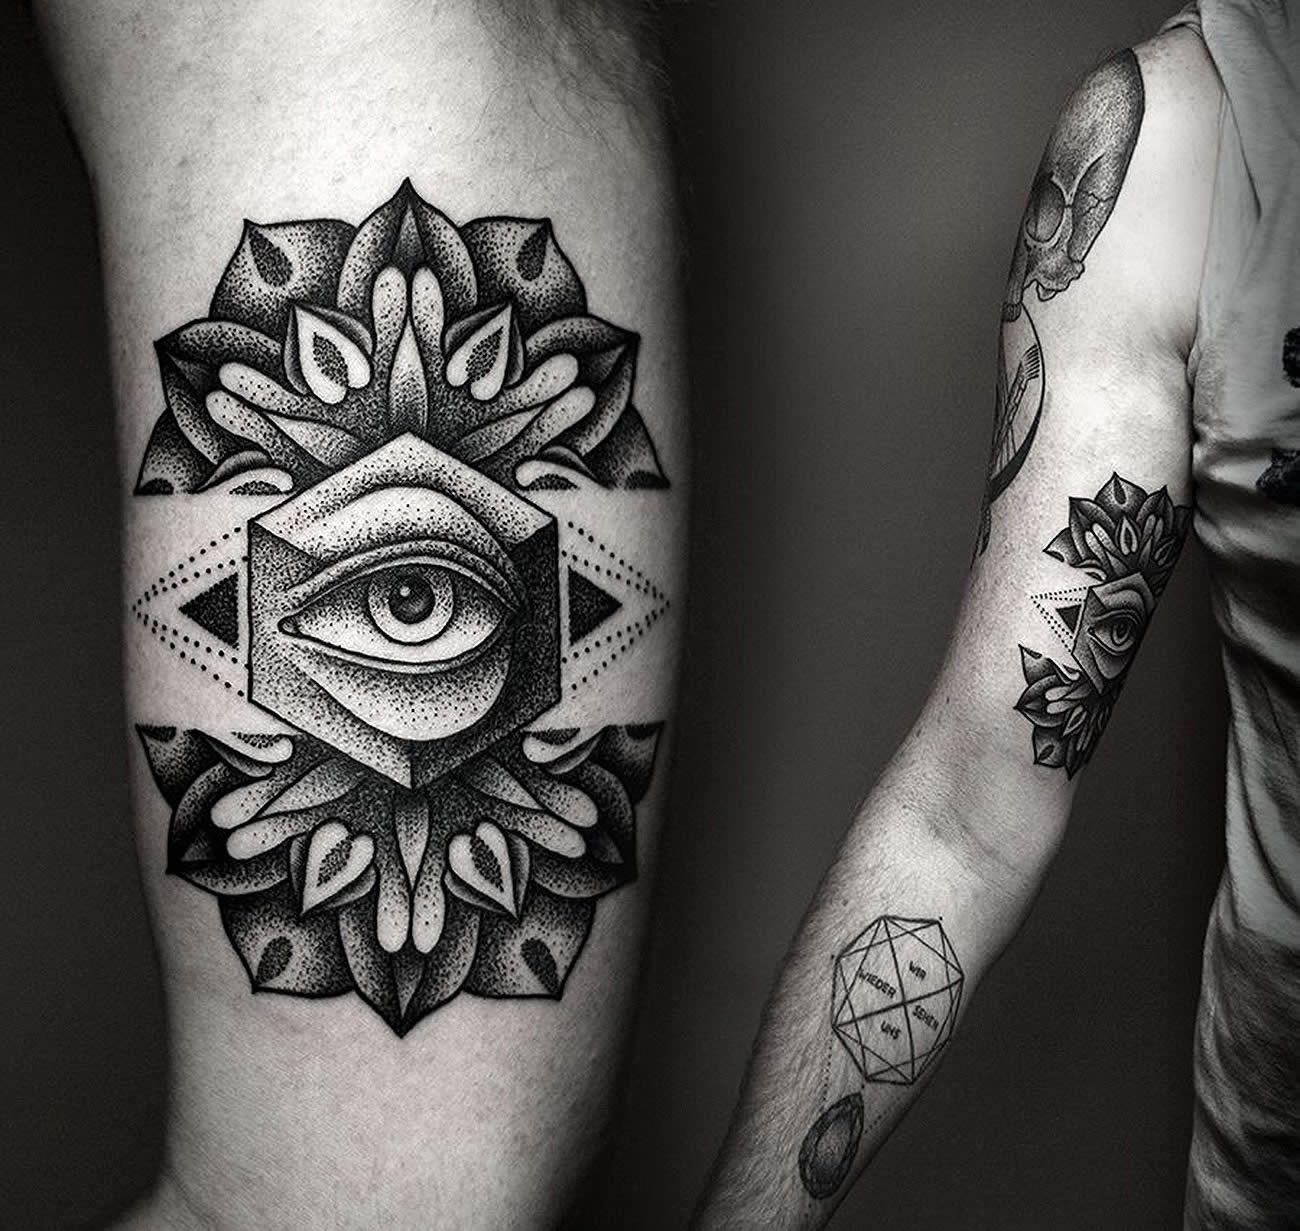 Tattoo and photo by © Kamil Czapiga. °